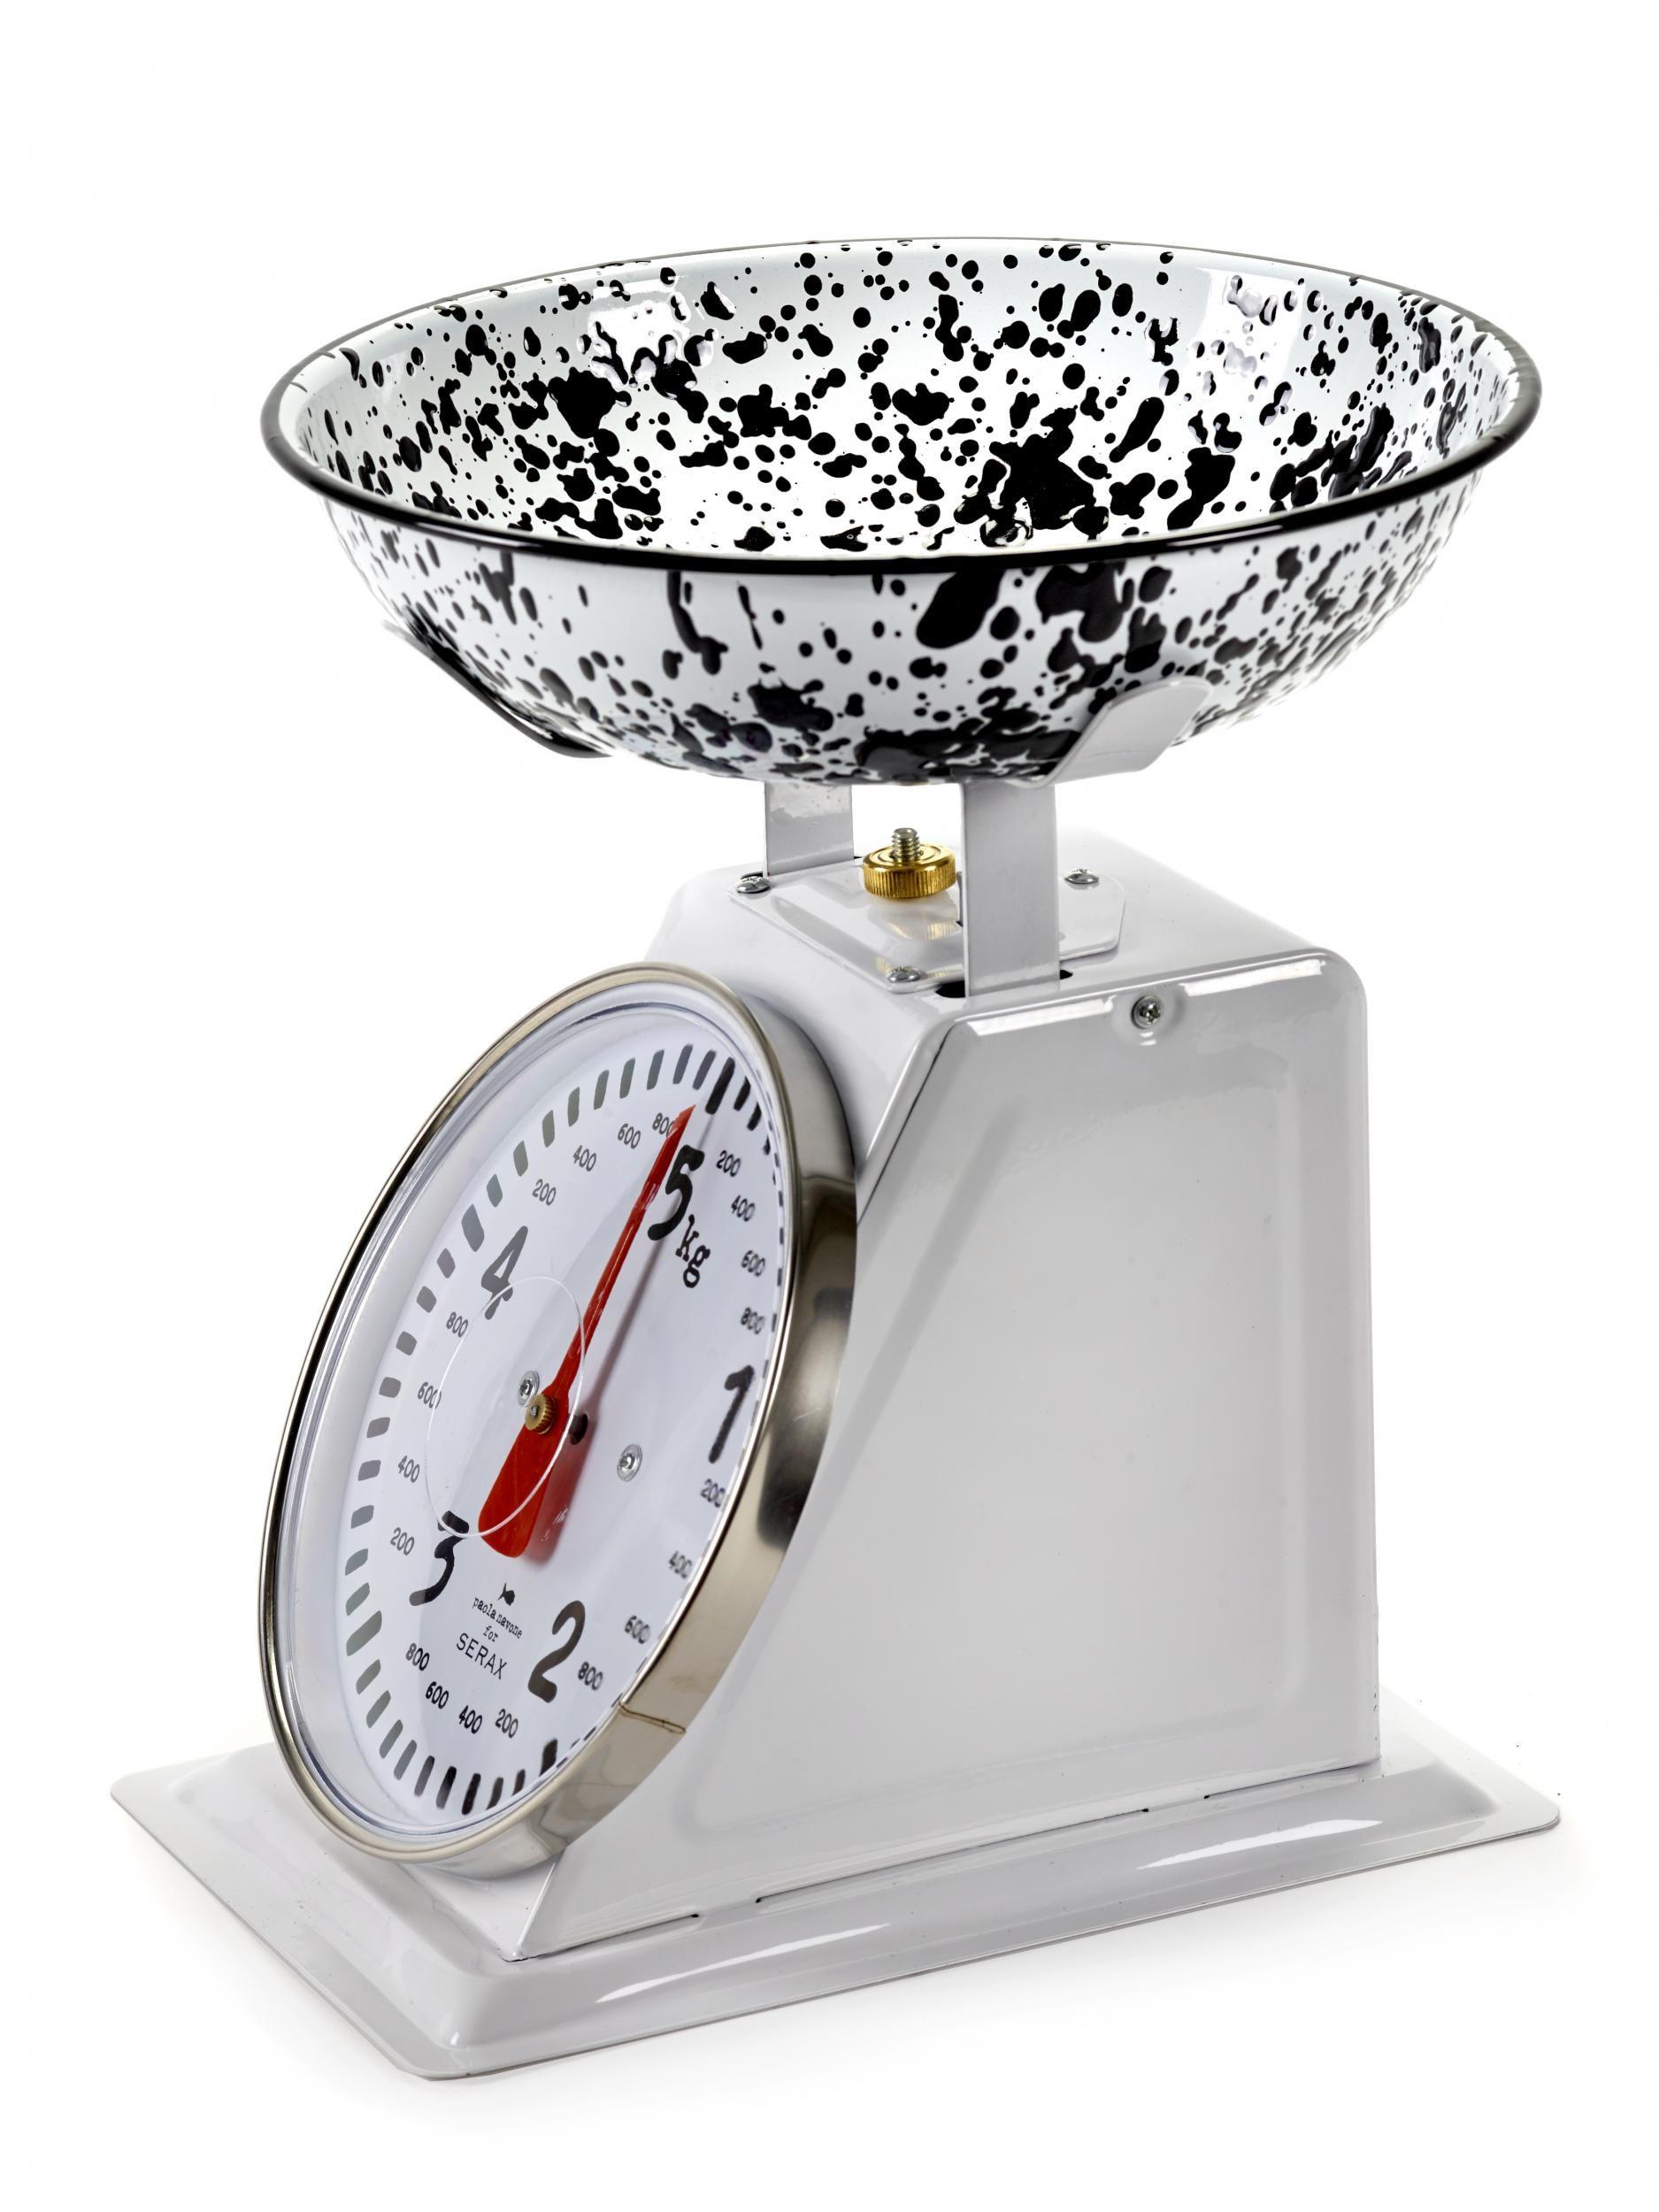 Balance de cuisine m canique pasta pasta serax noir blanc h 30 made in design - Balance de cuisine mecanique ...